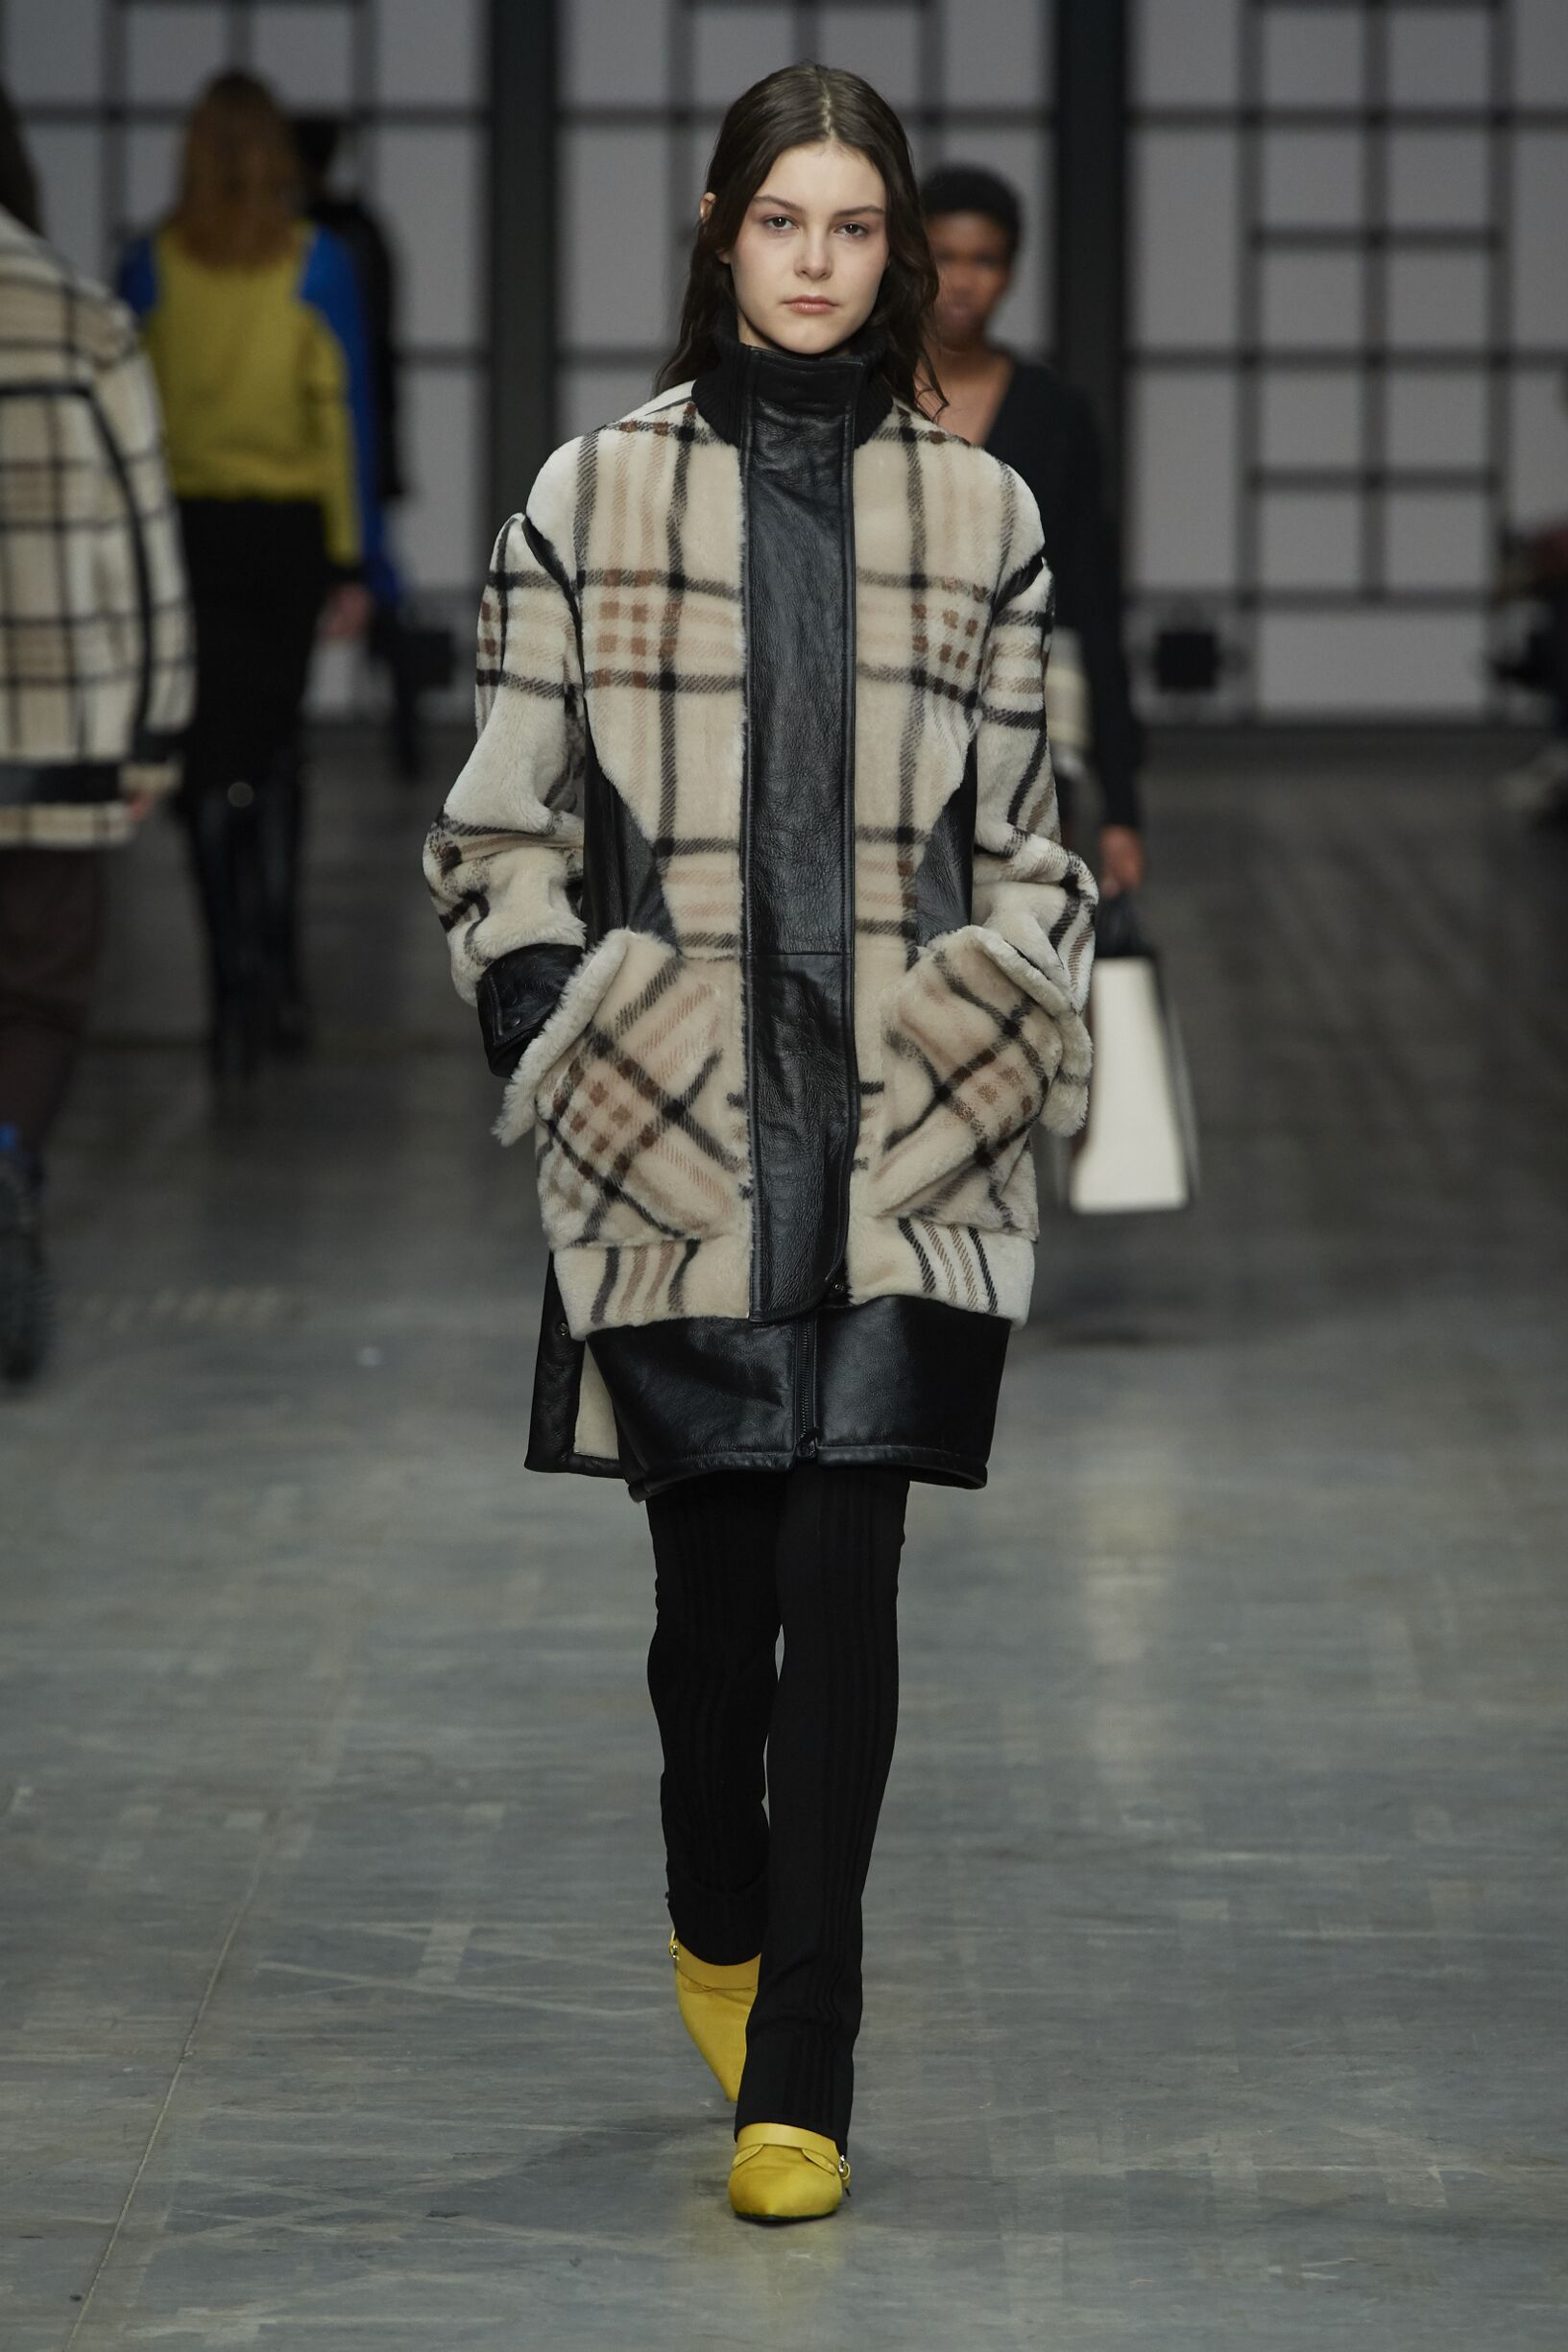 Runway Trussardi Fall Winter 2018 Women's Collection Milan Fashion Week